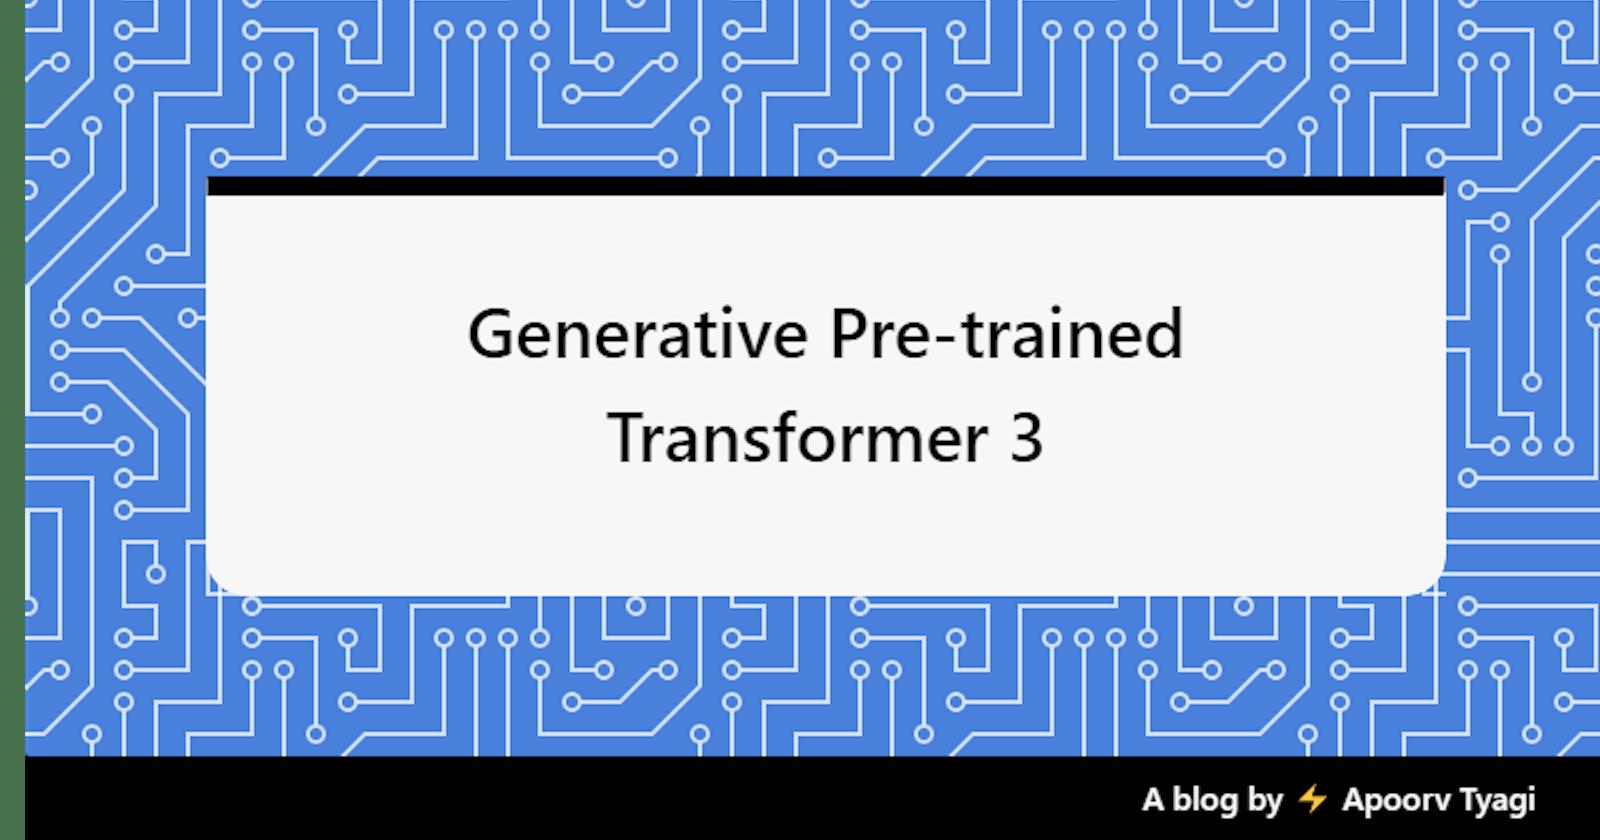 Generative Pre-trained Transformer - 3